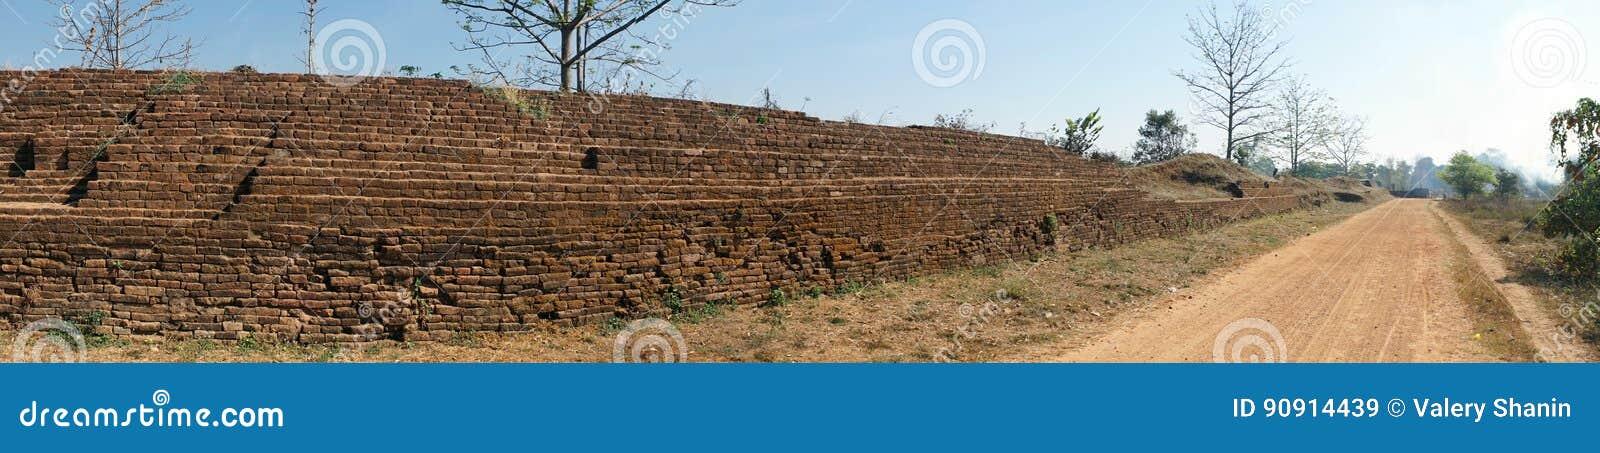 Древняя стена и дорога